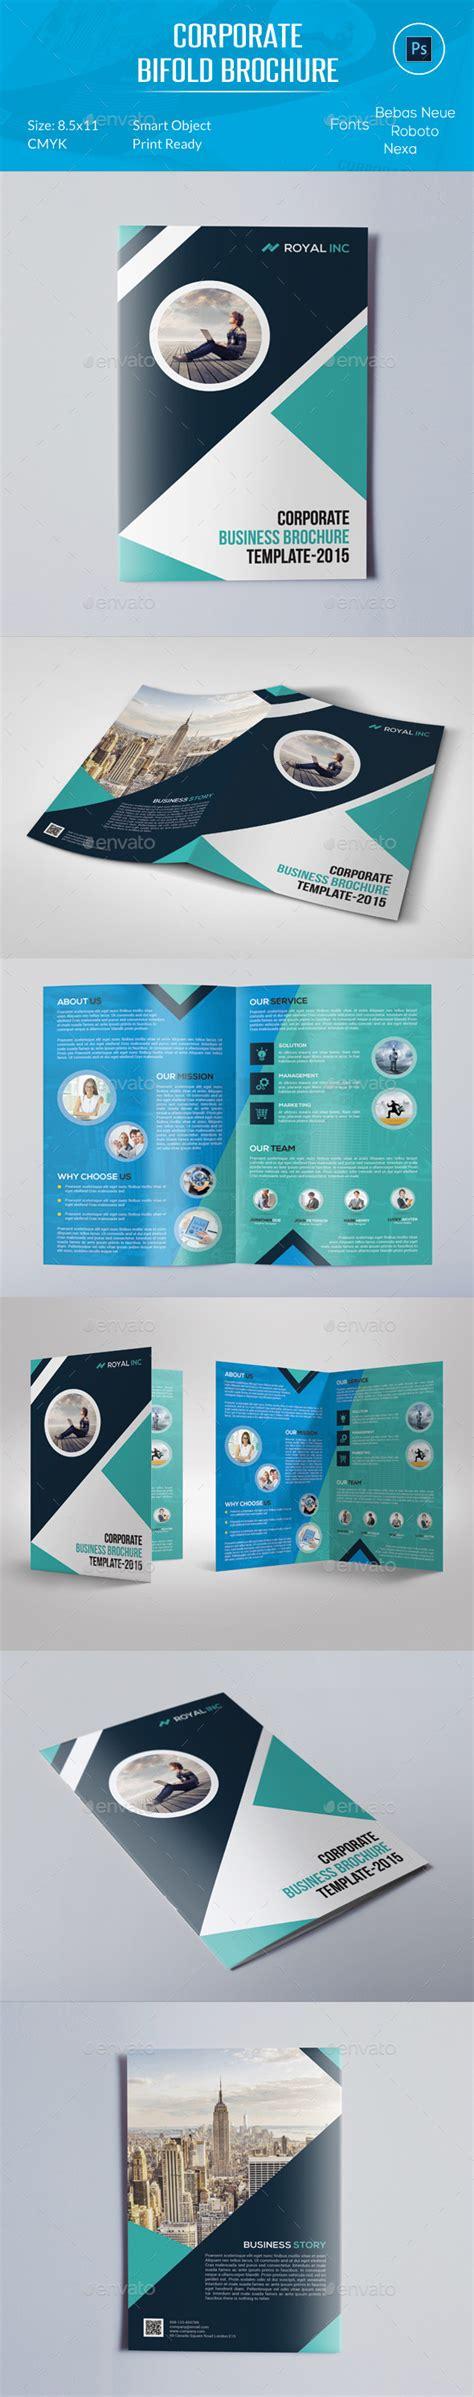 brochure templates for photoshop elements photoshop elements bifold brochure template vertical